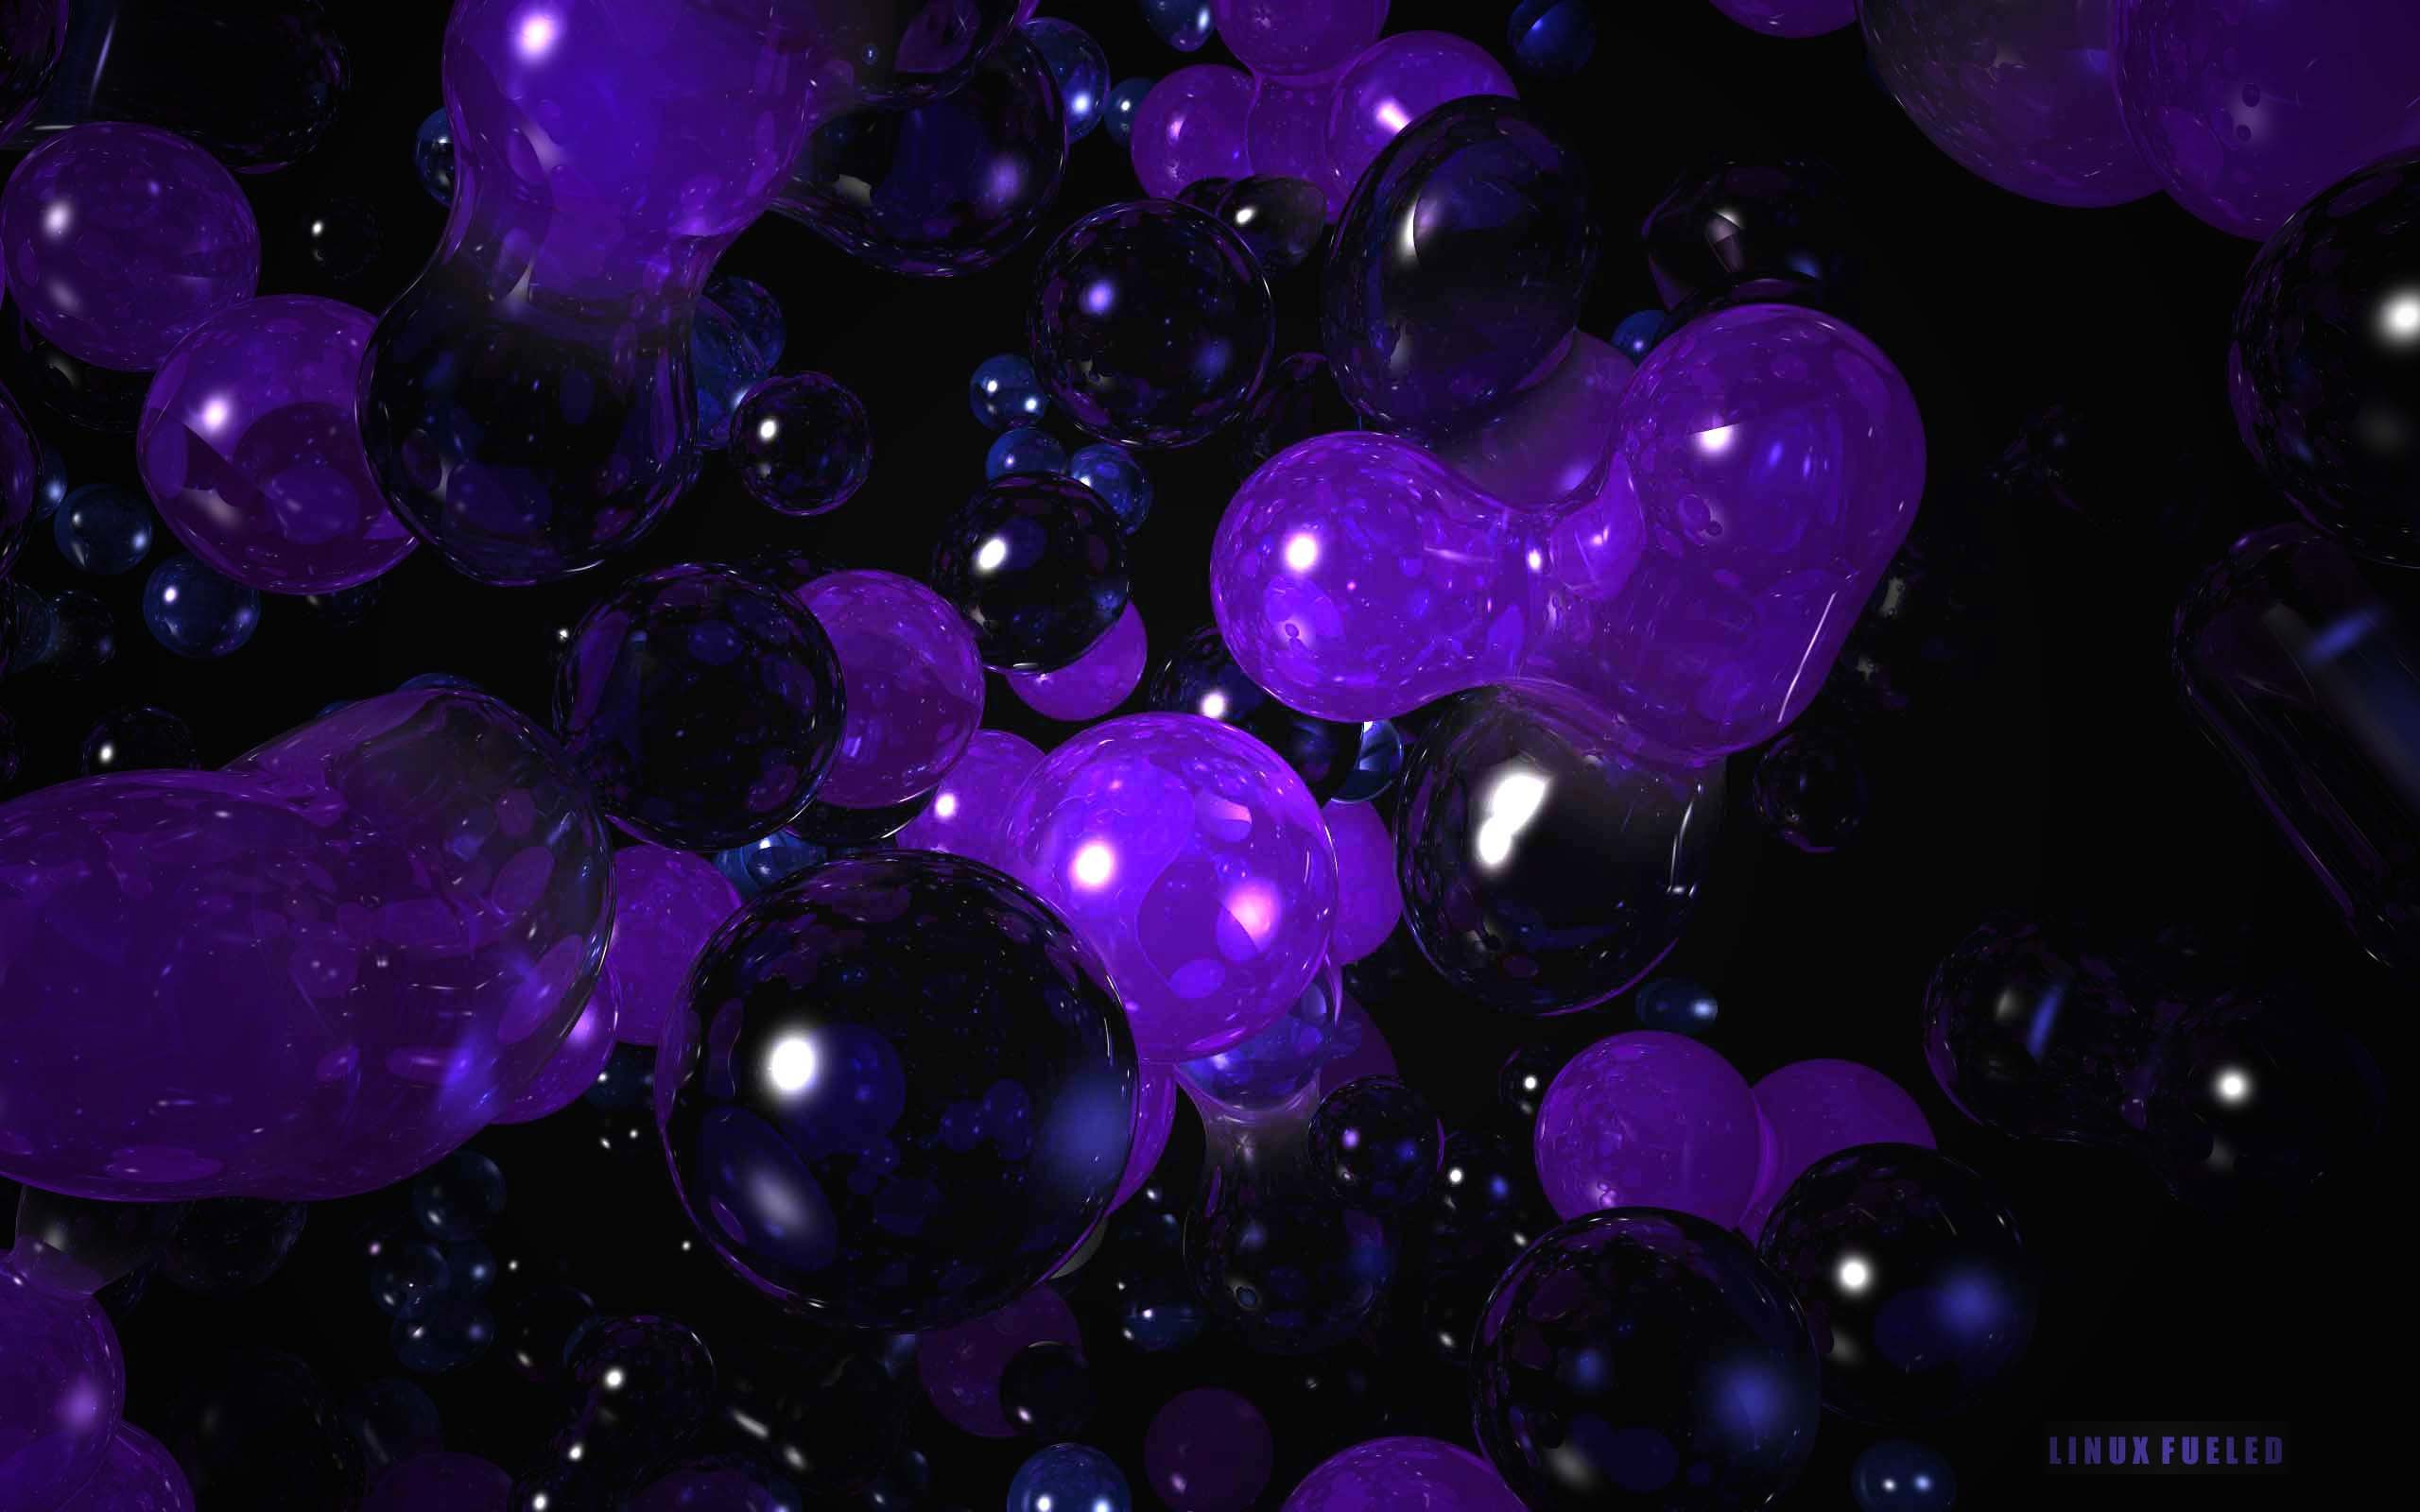 Purple Widescreen Wallpaper